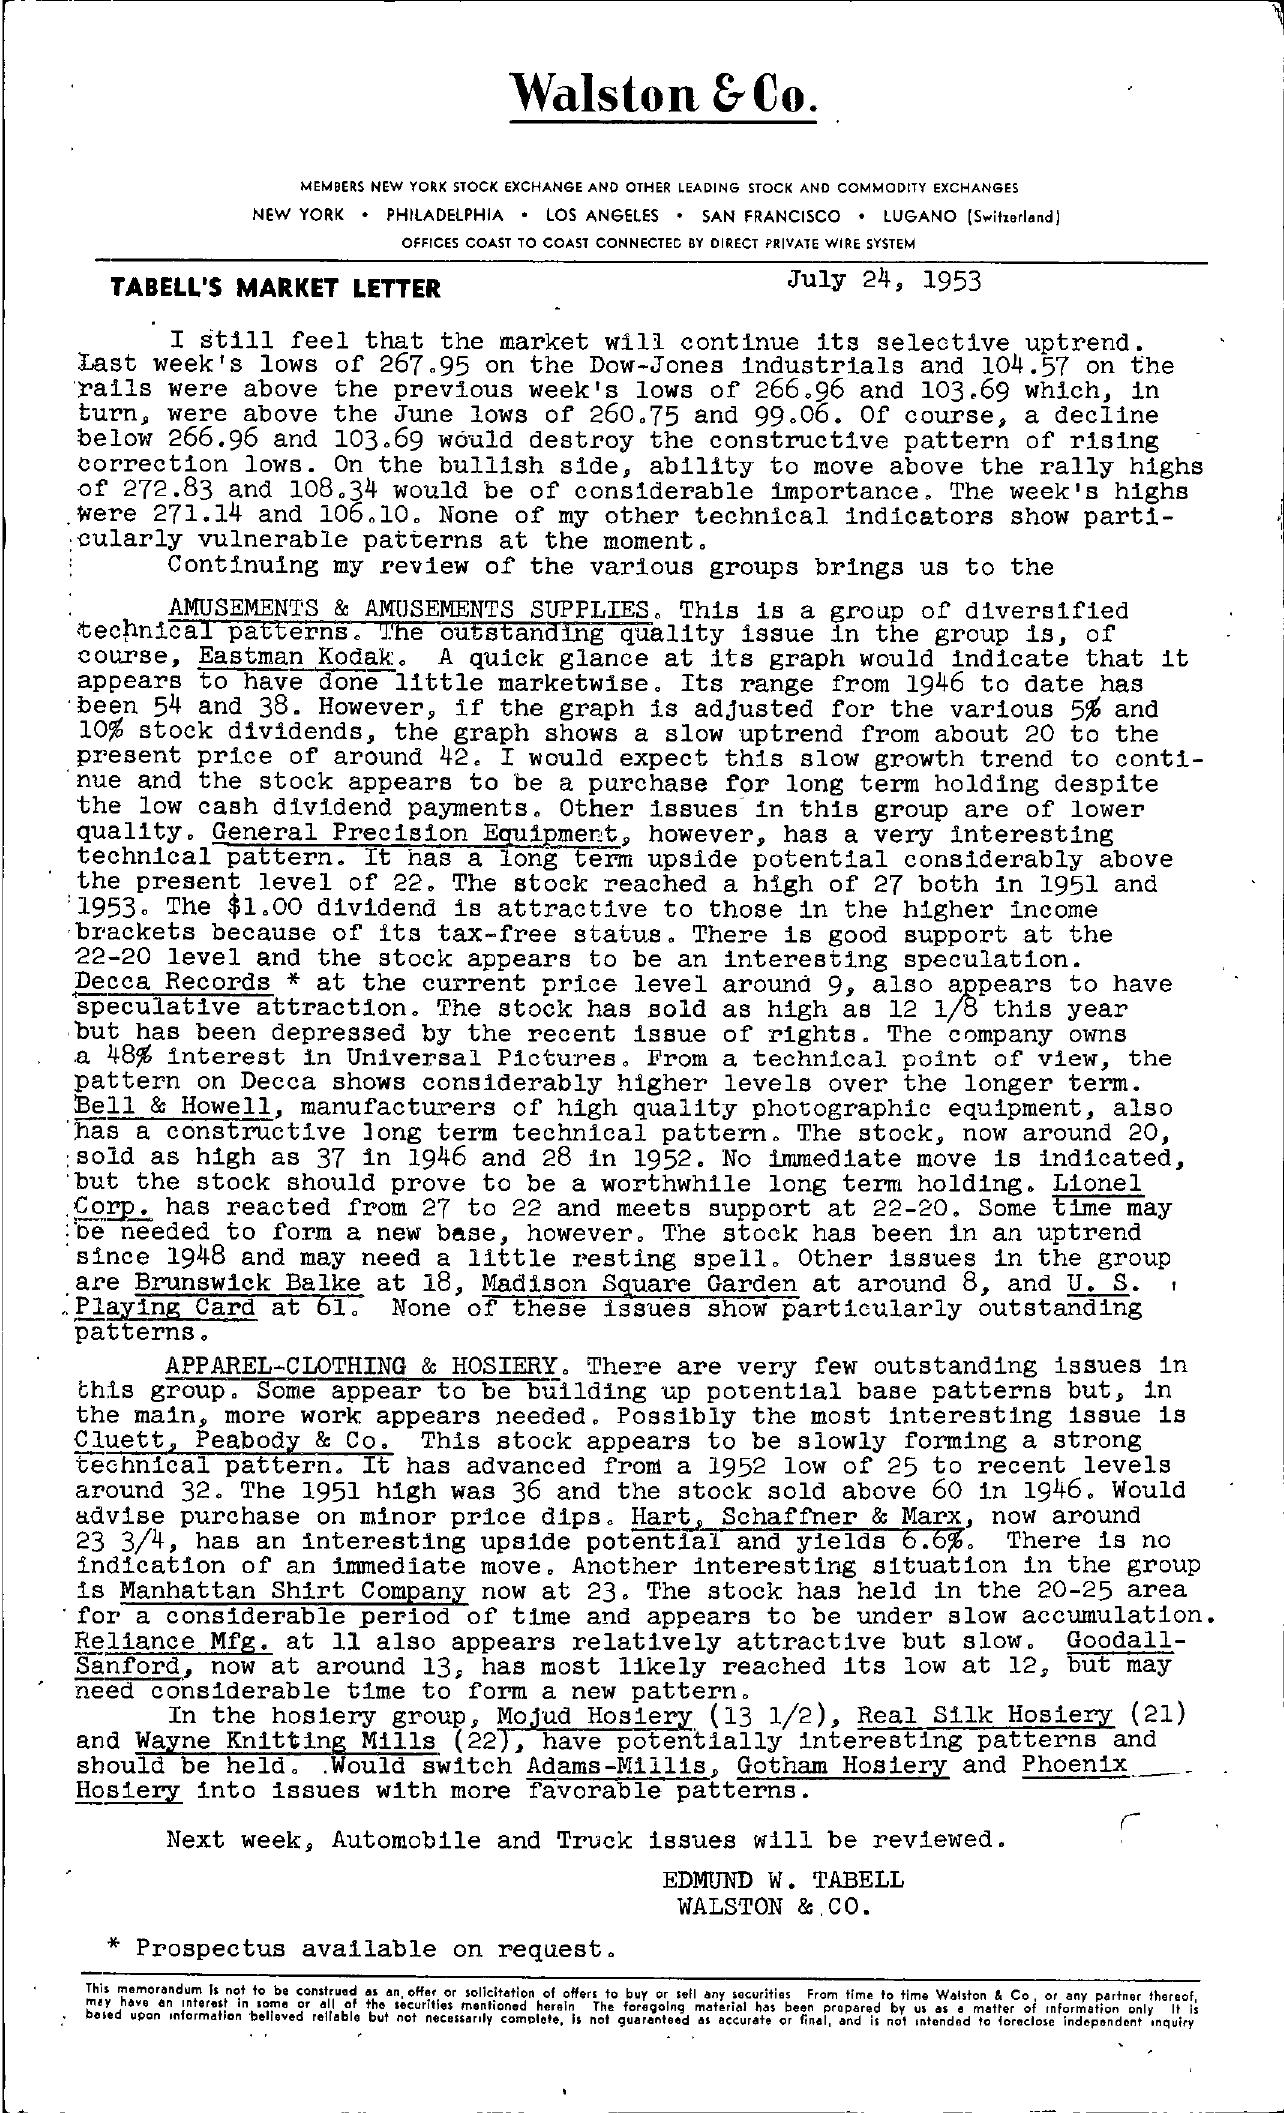 Tabell's Market Letter - July 24, 1953